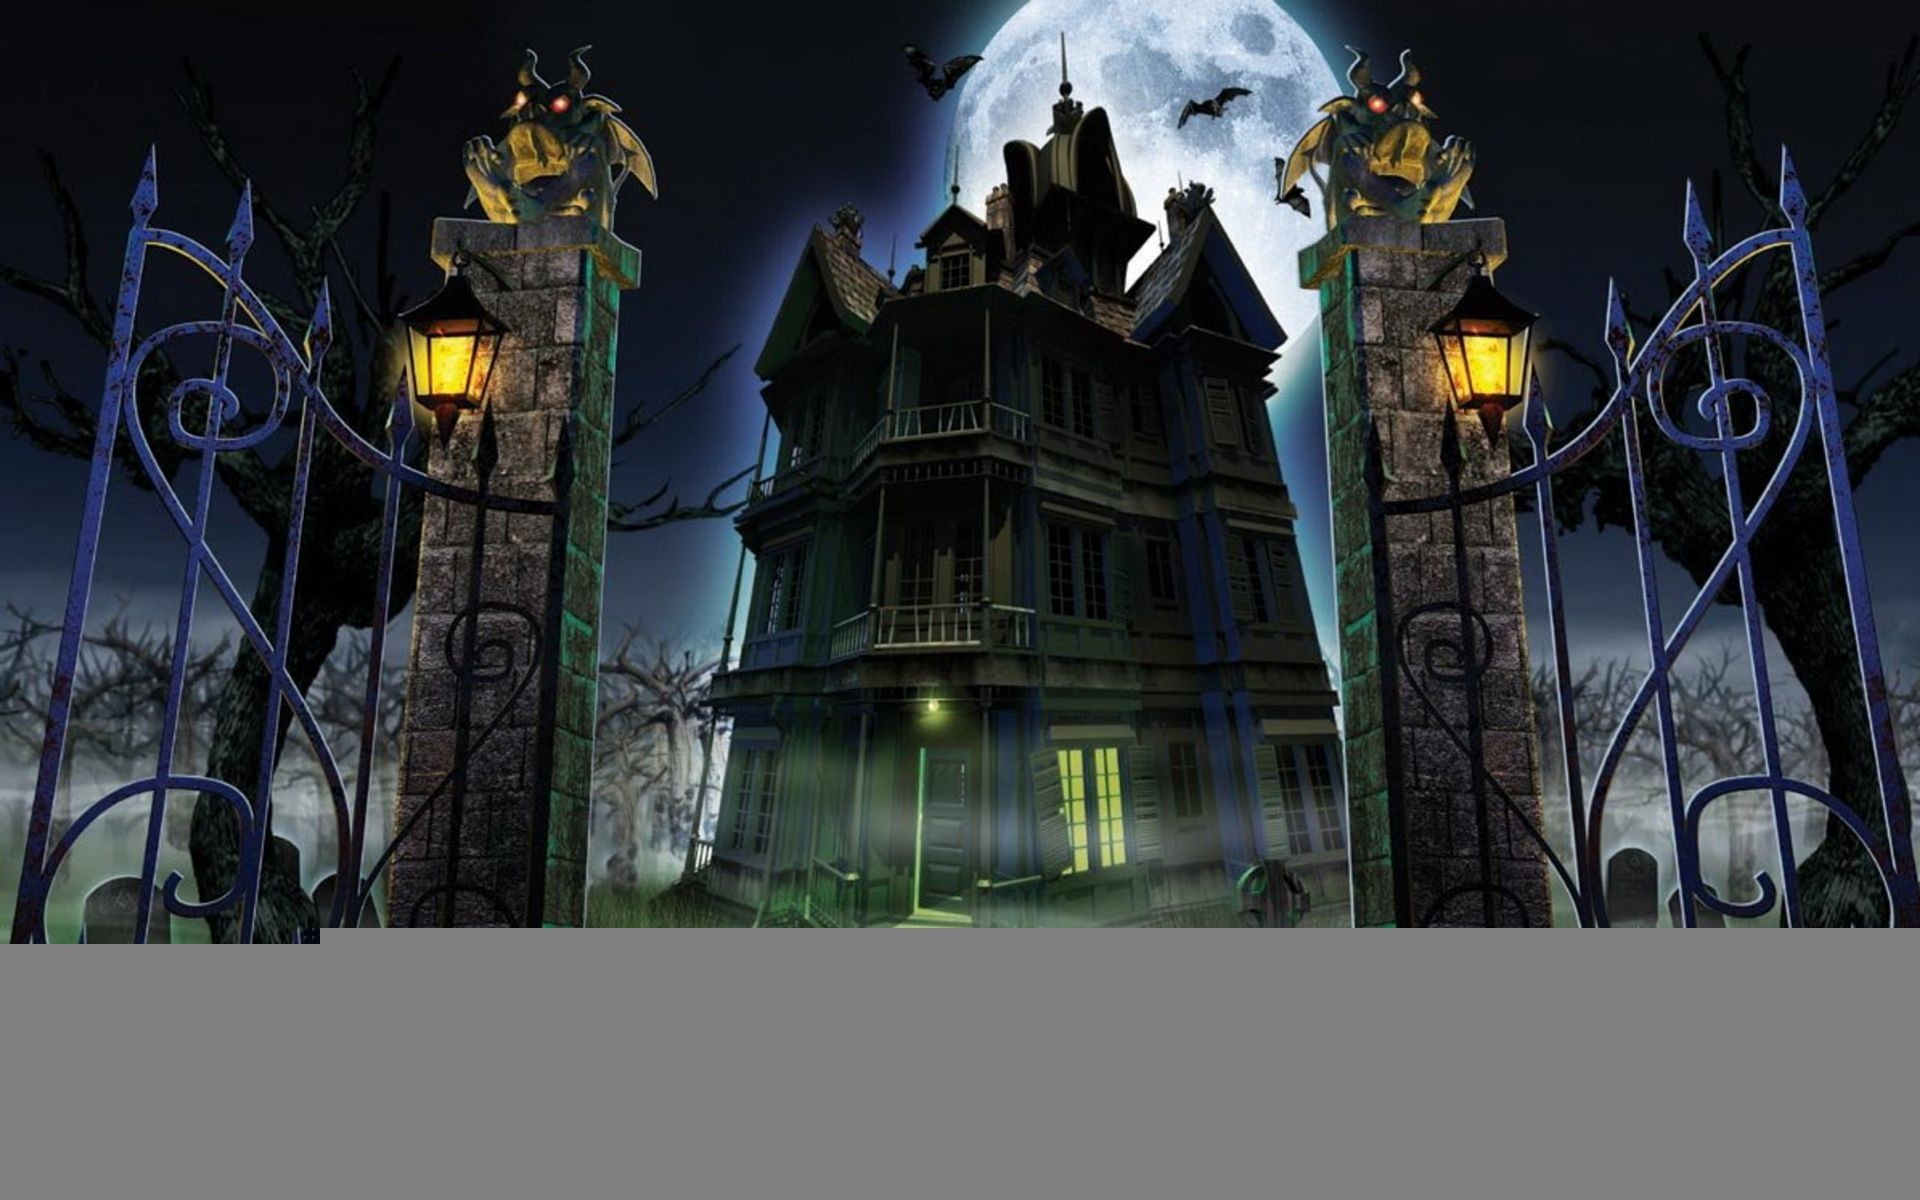 Halloween Haunted House HD Wallpaper